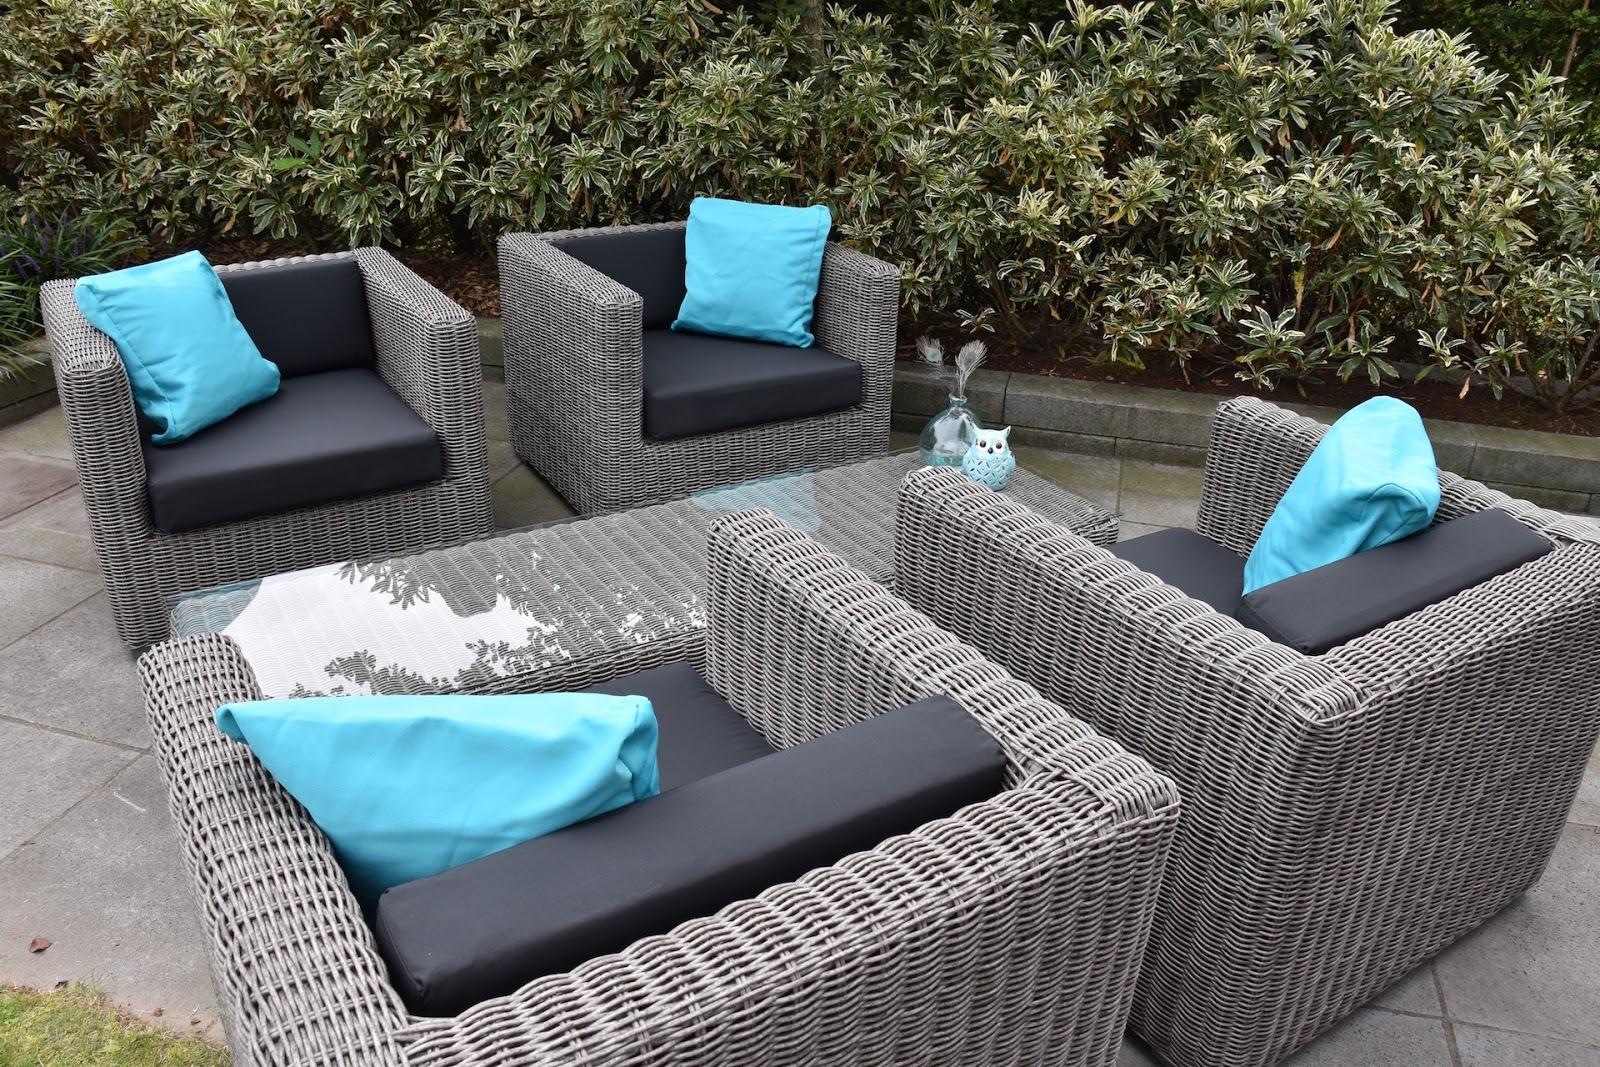 Arbrini design tuinmeubelen for Decoratie voor terras